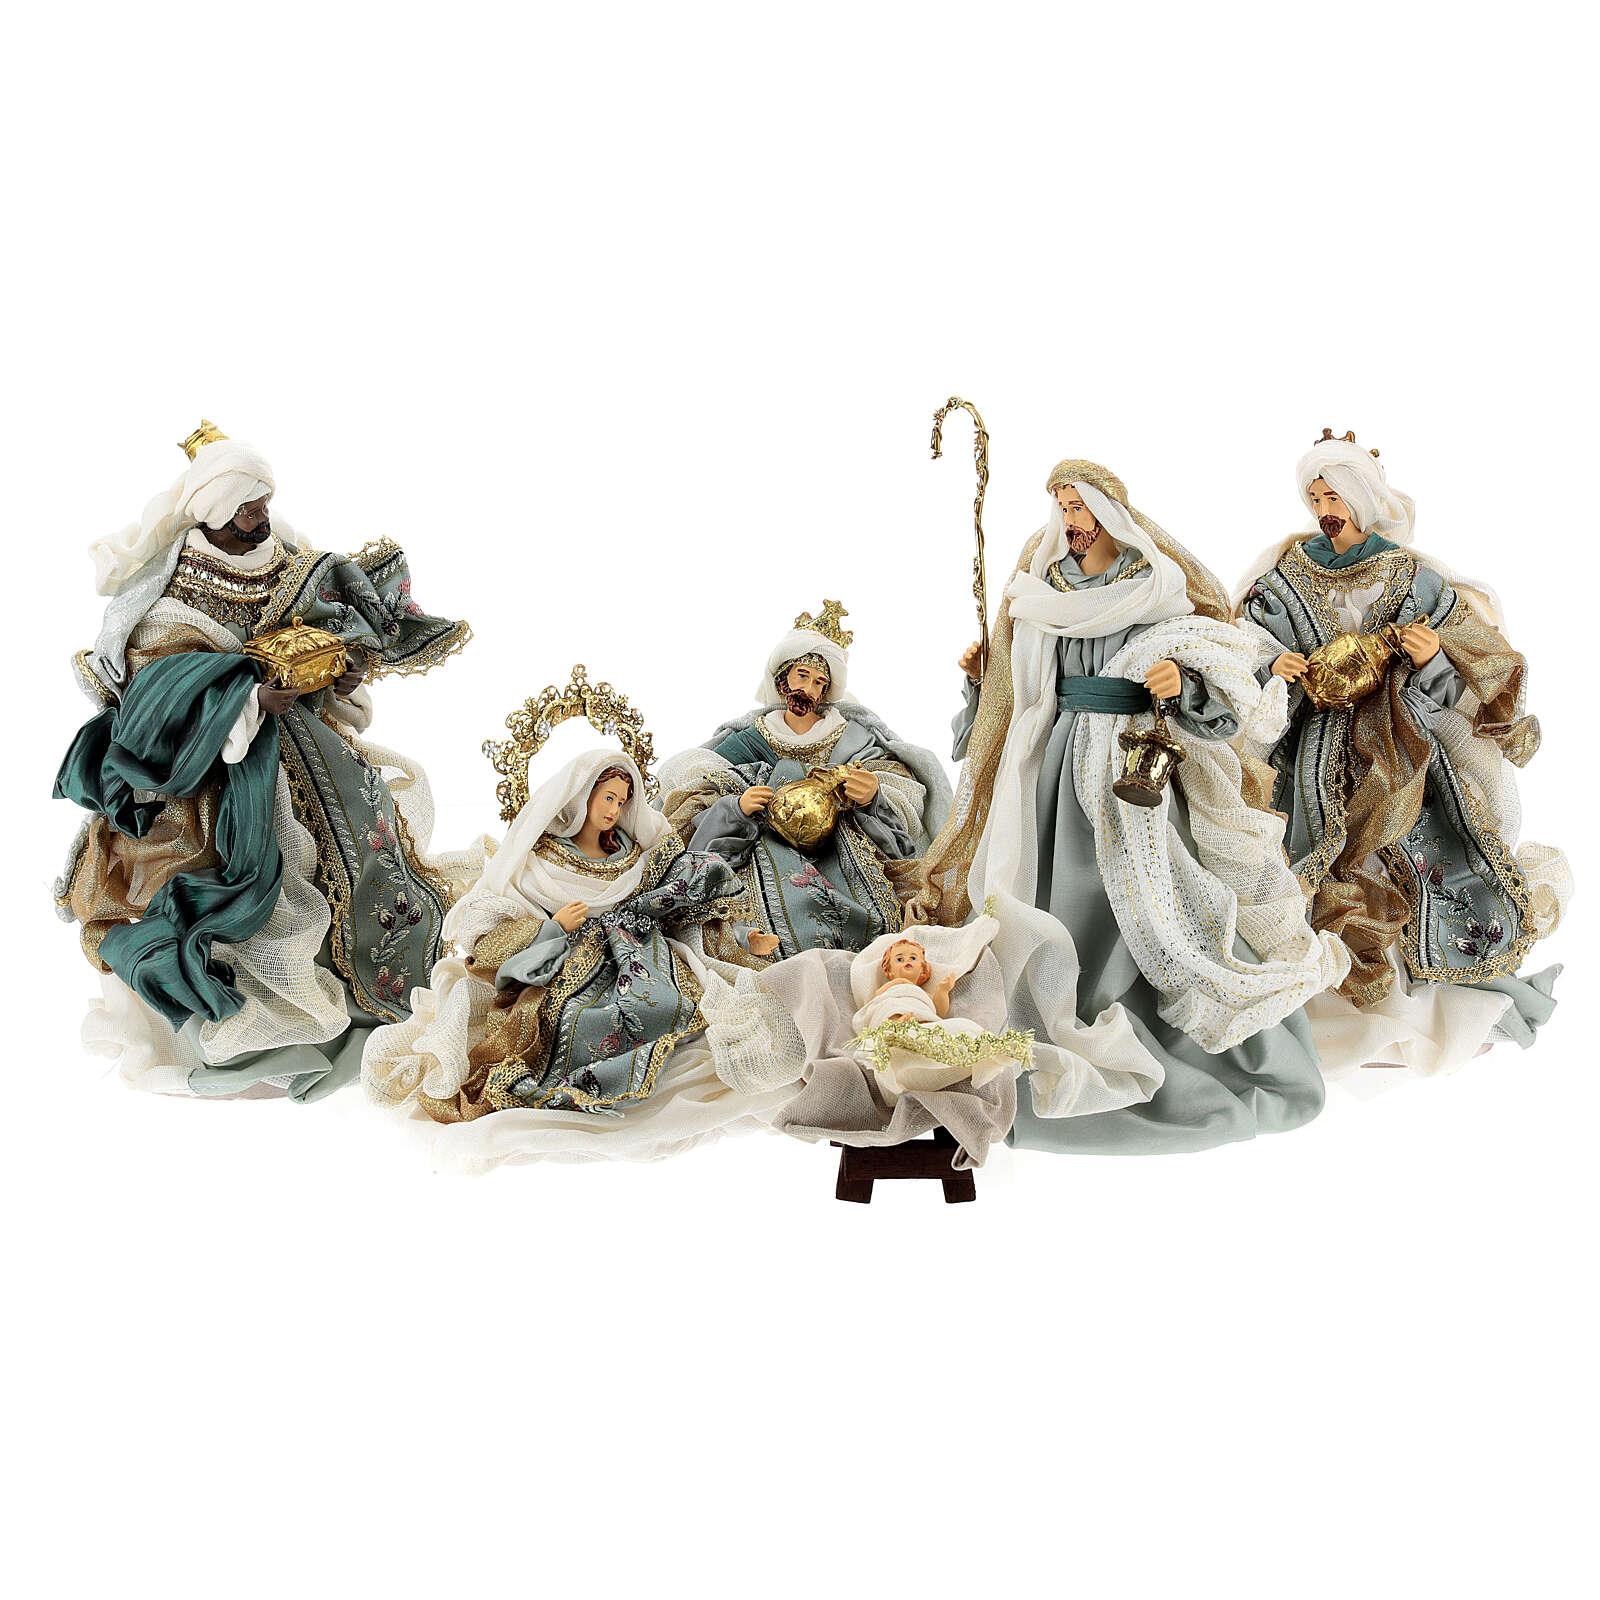 Natività 6 pezzi Blu Gold resina stoffa stile veneziano 30 cm 4